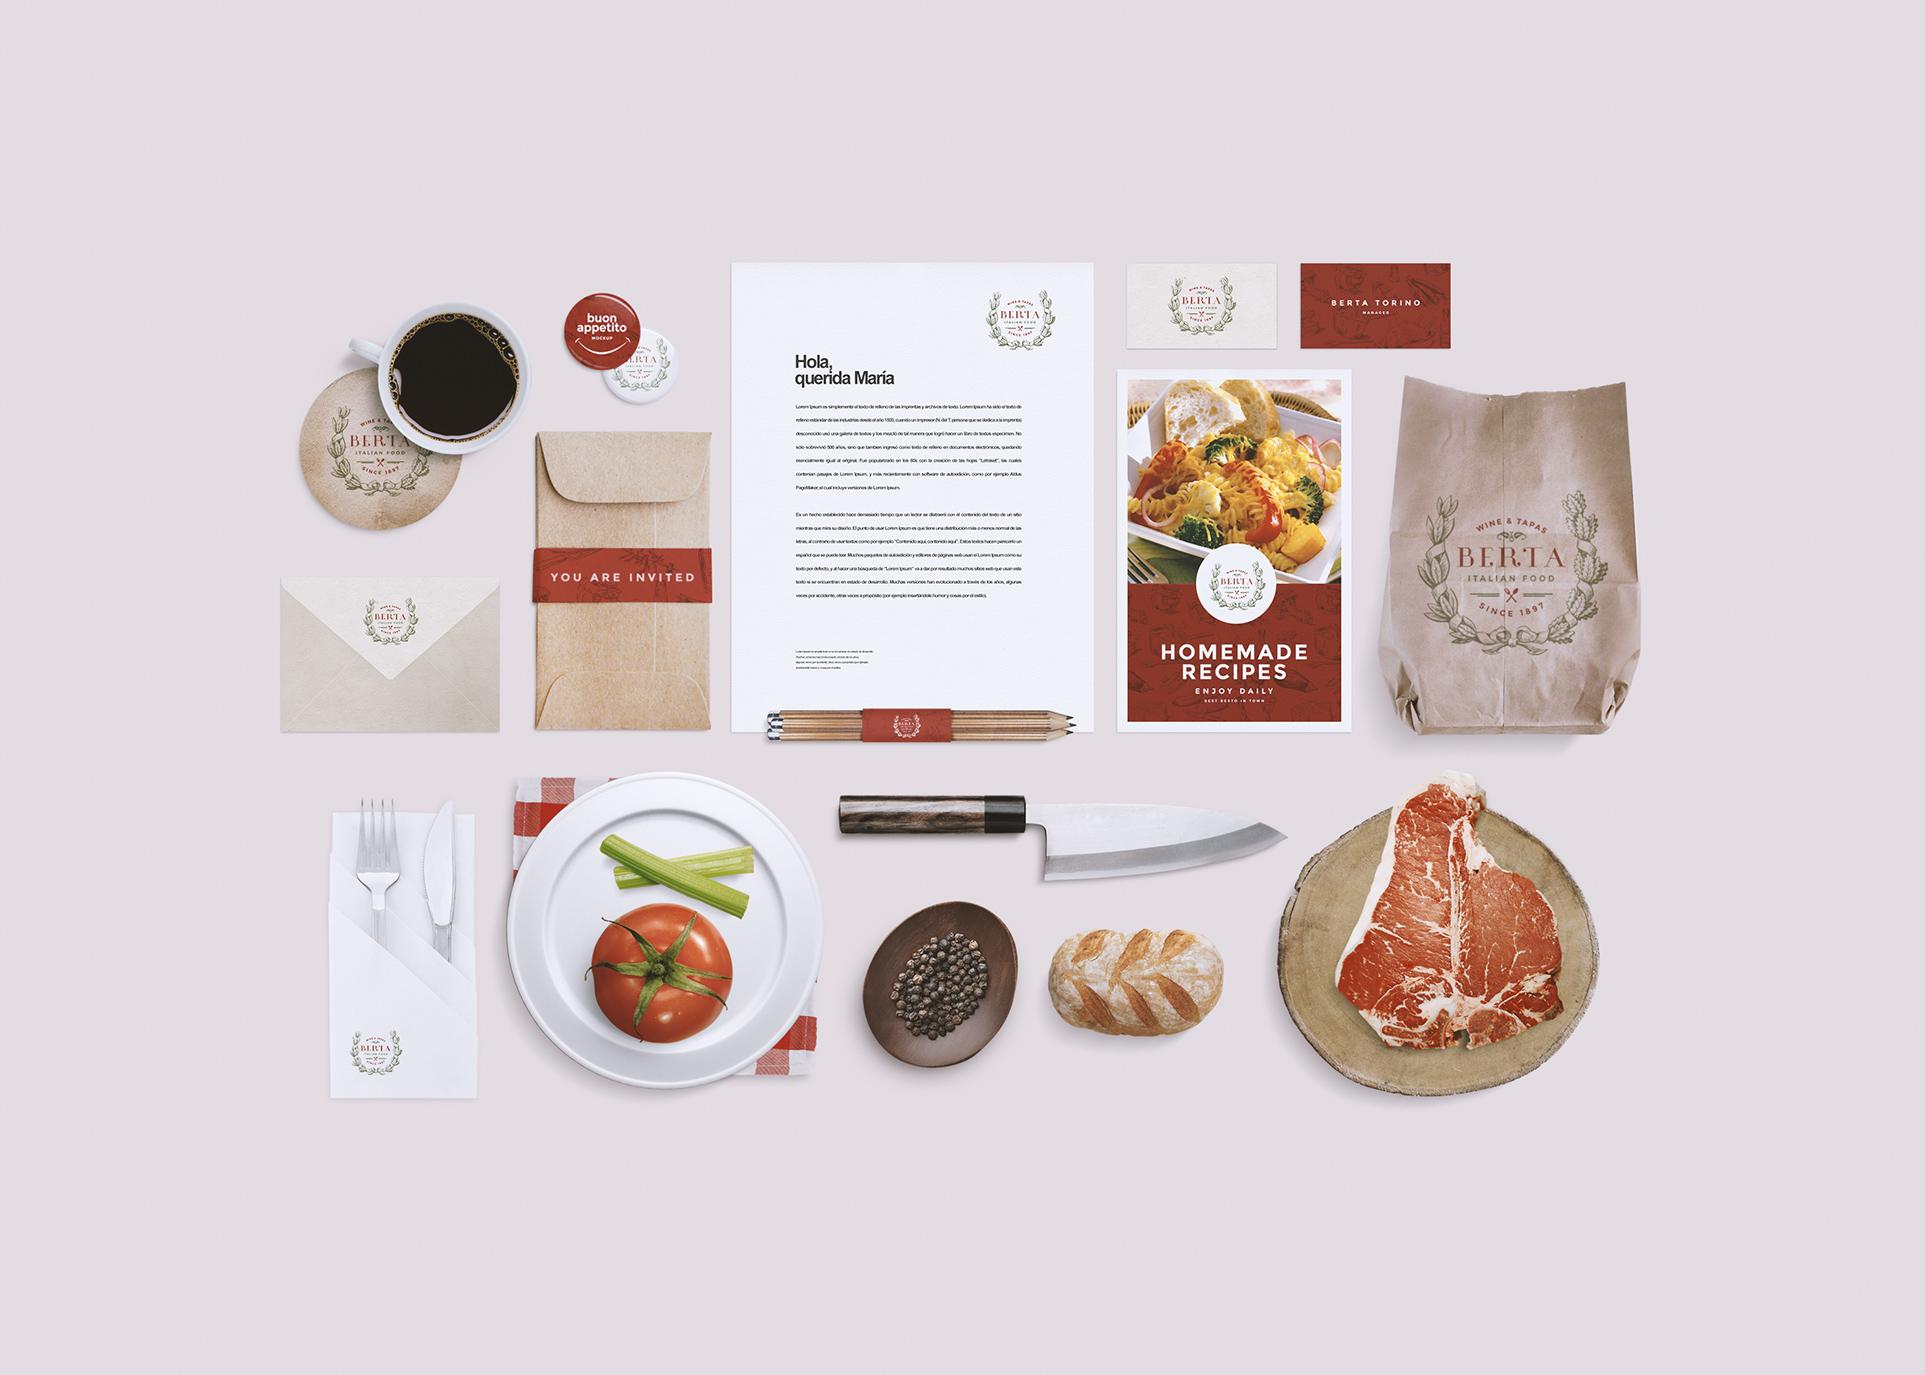 RestaurantFood Identity Mockup Product Mockups On